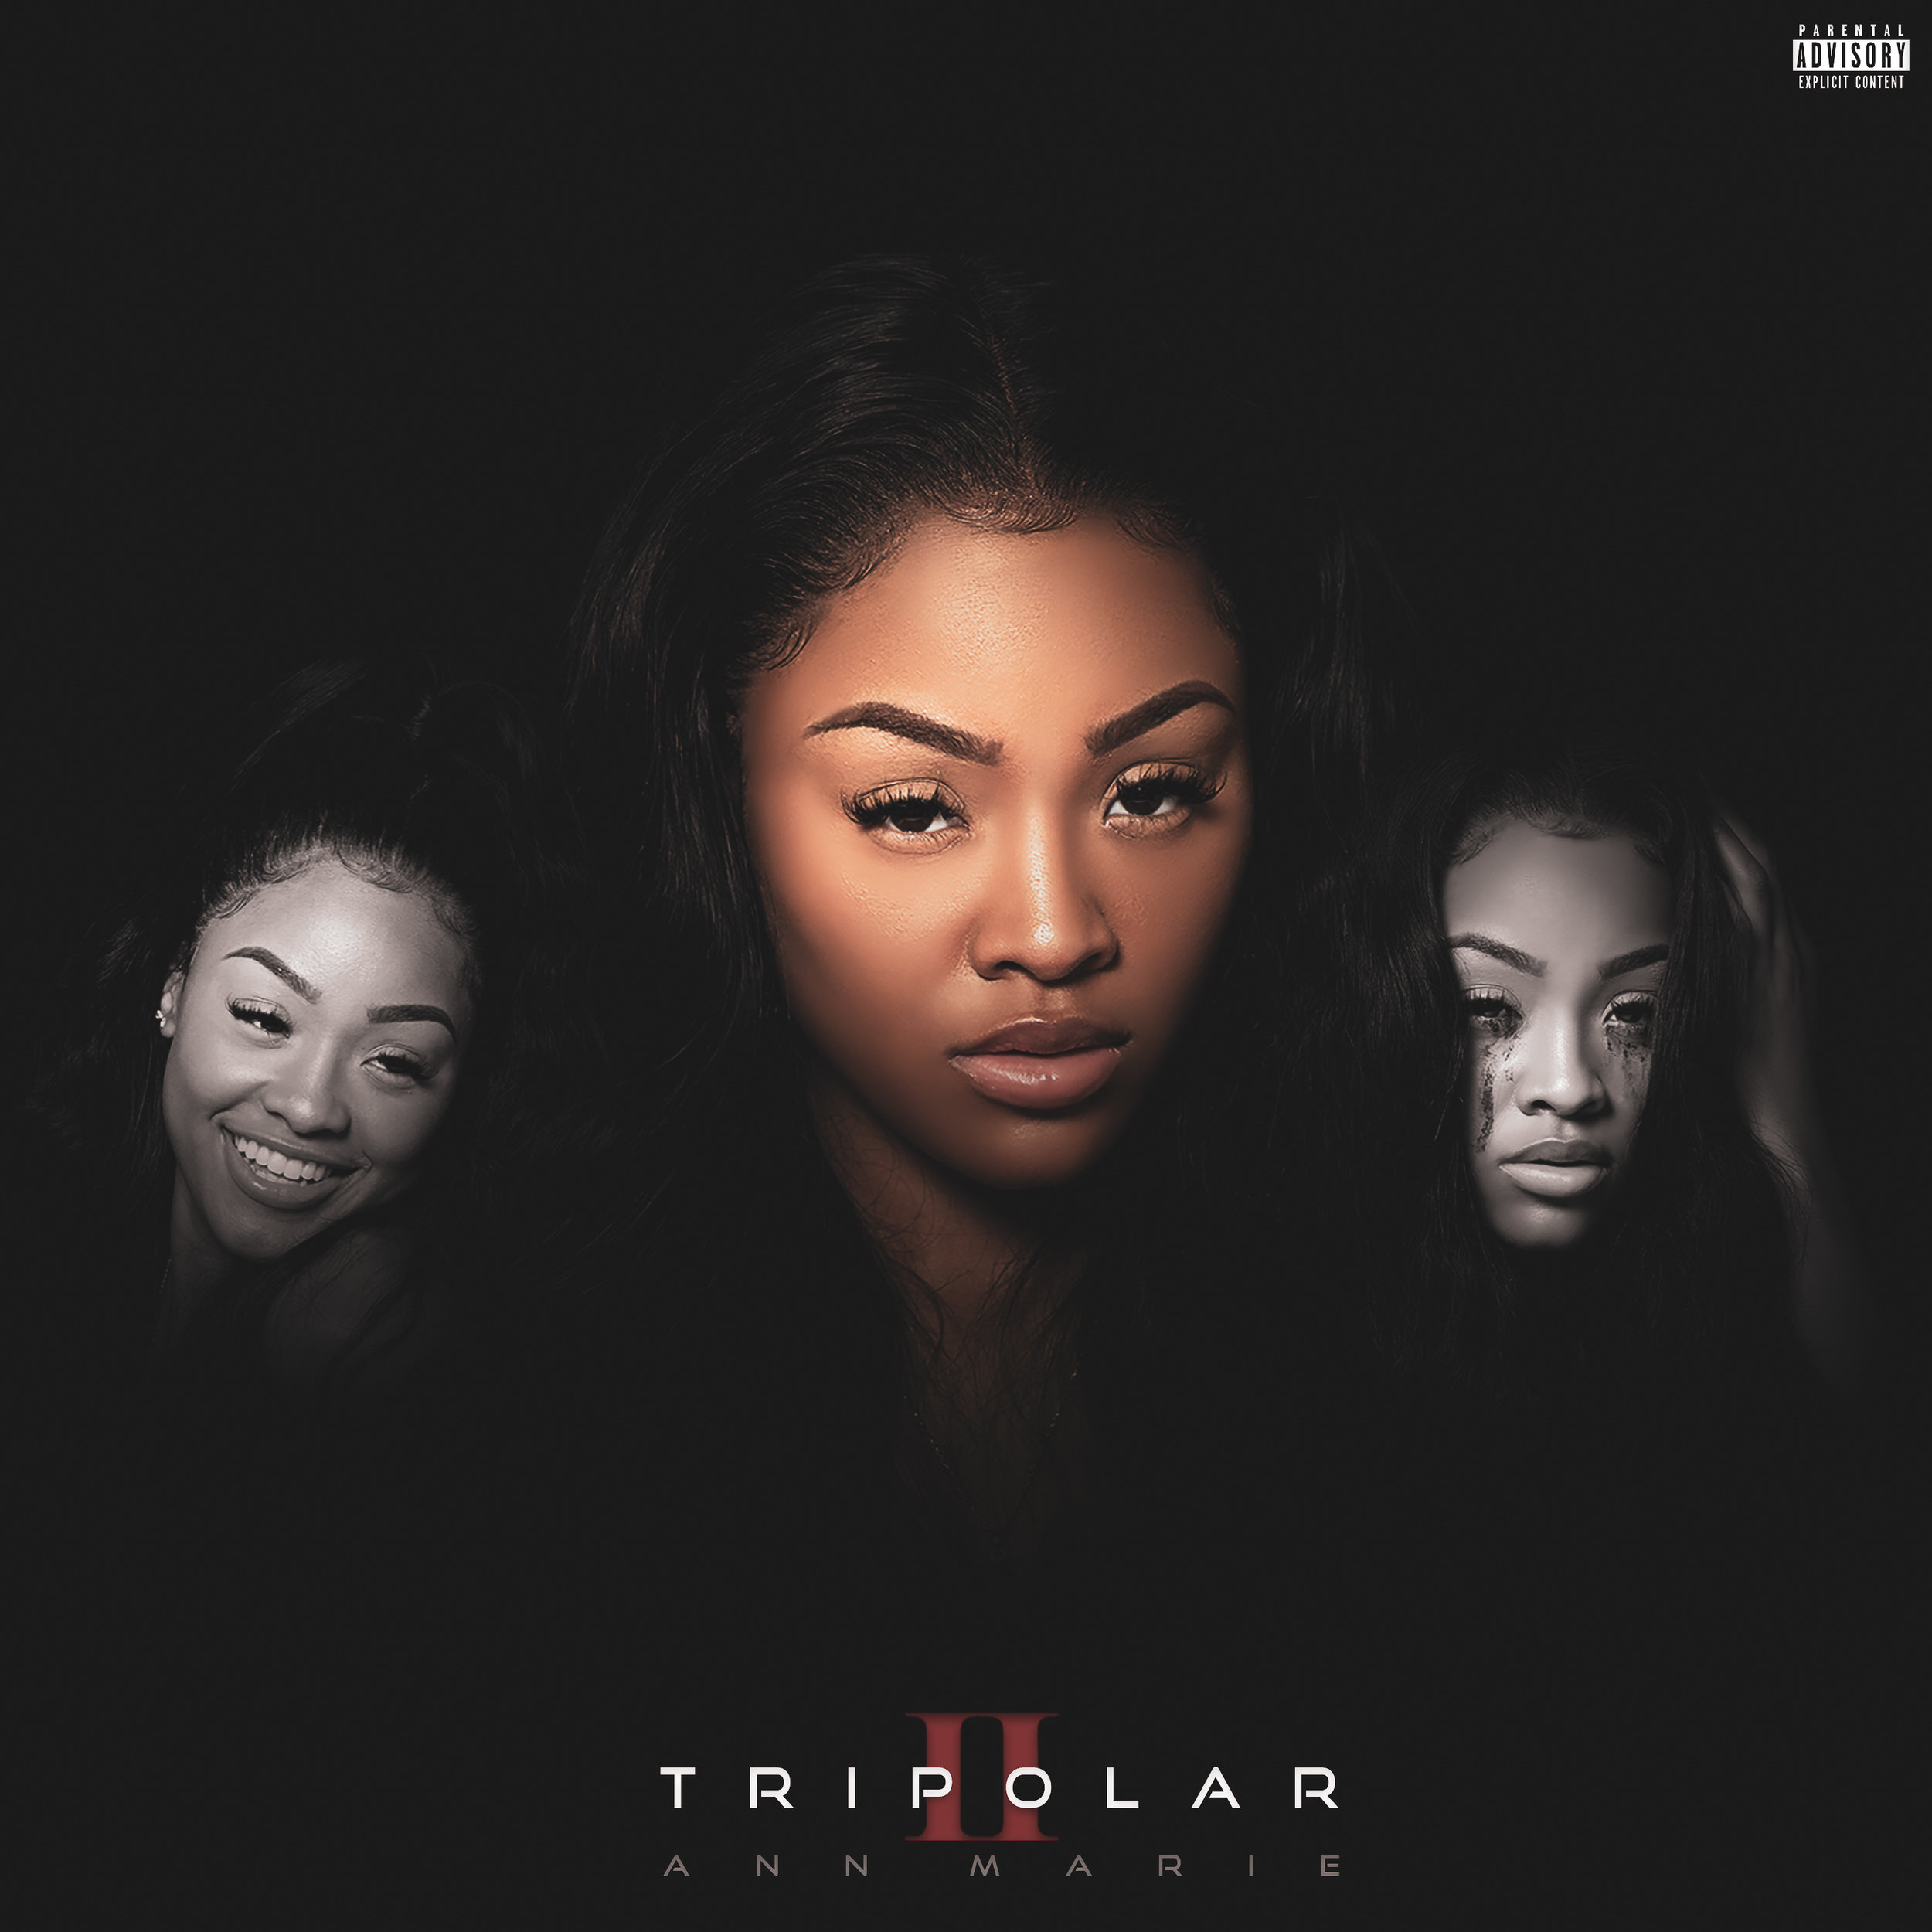 Tripolar II - Cover Art.JPG